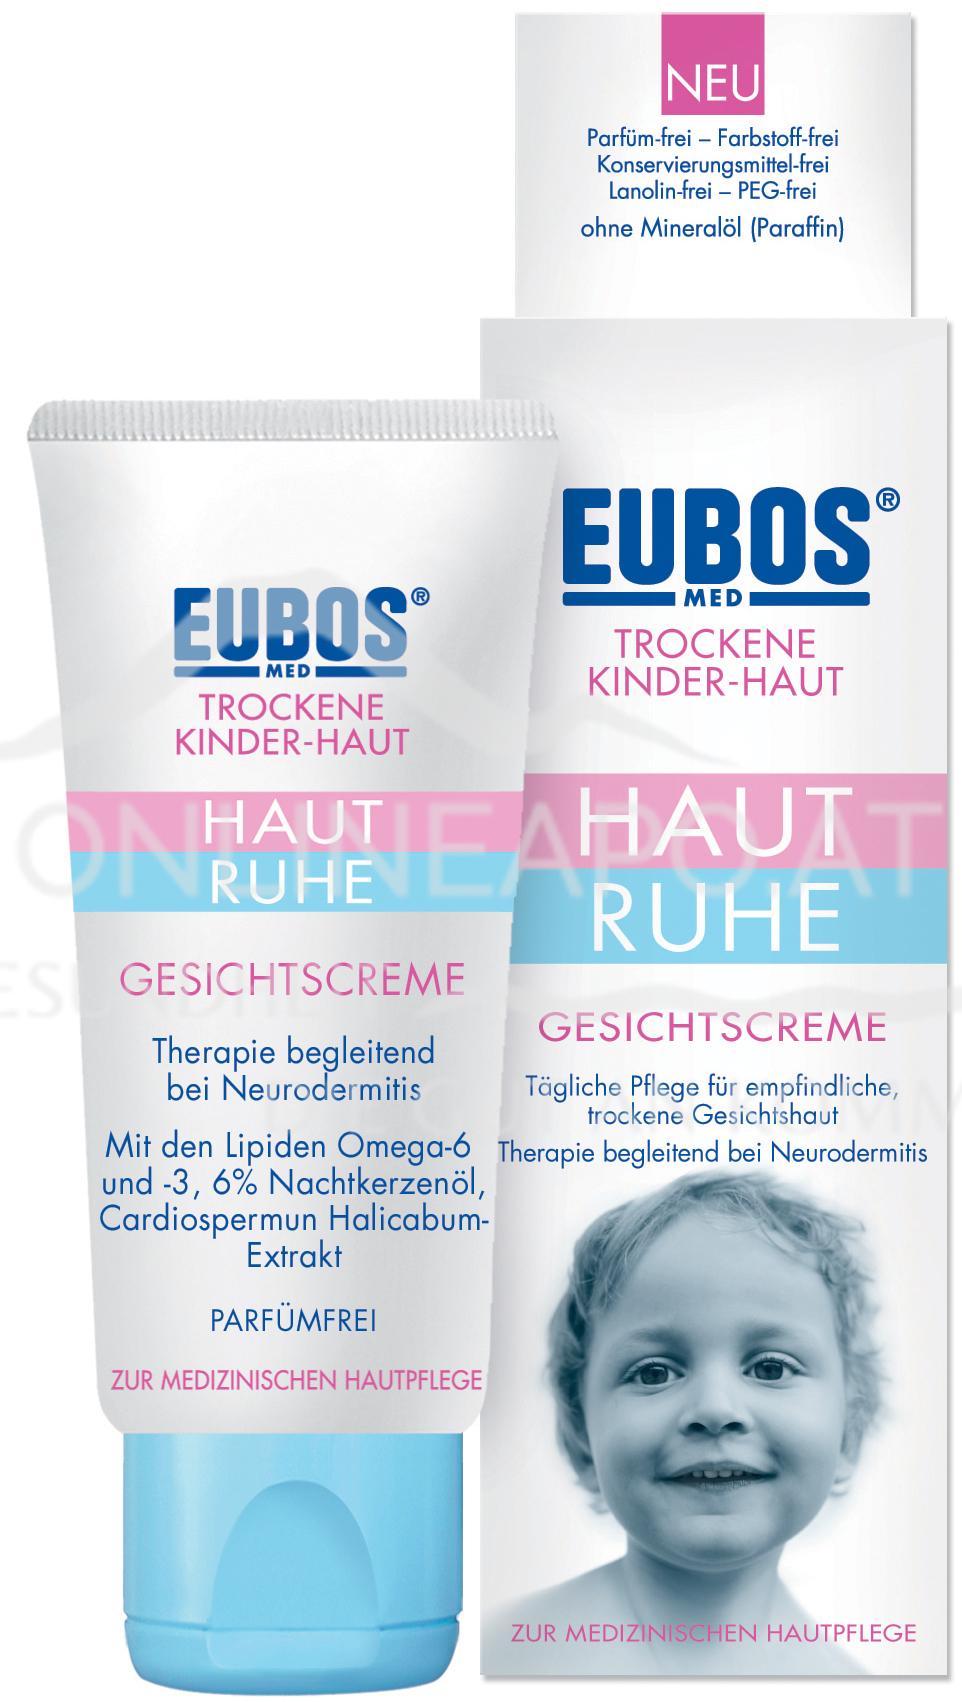 Eubos Haut Ruhe Gesichtscreme 30ml